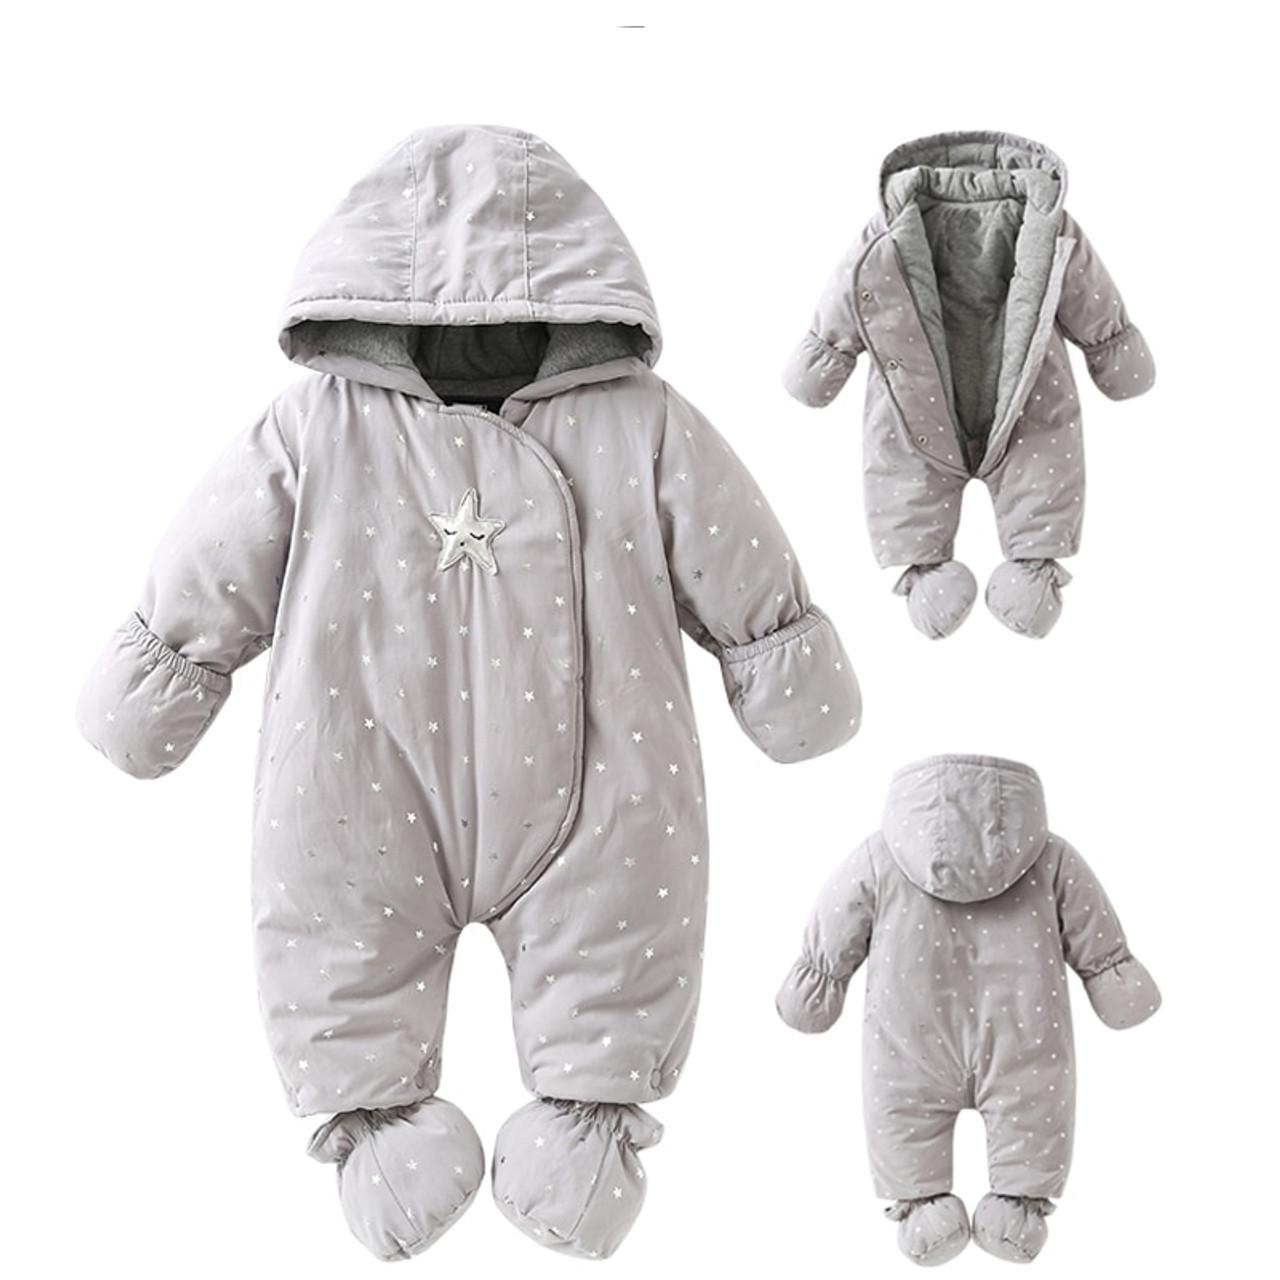 ac19e2992d04 Newborn baby romper Winter 2018 baby girl boy Snowsuit warm baby ...